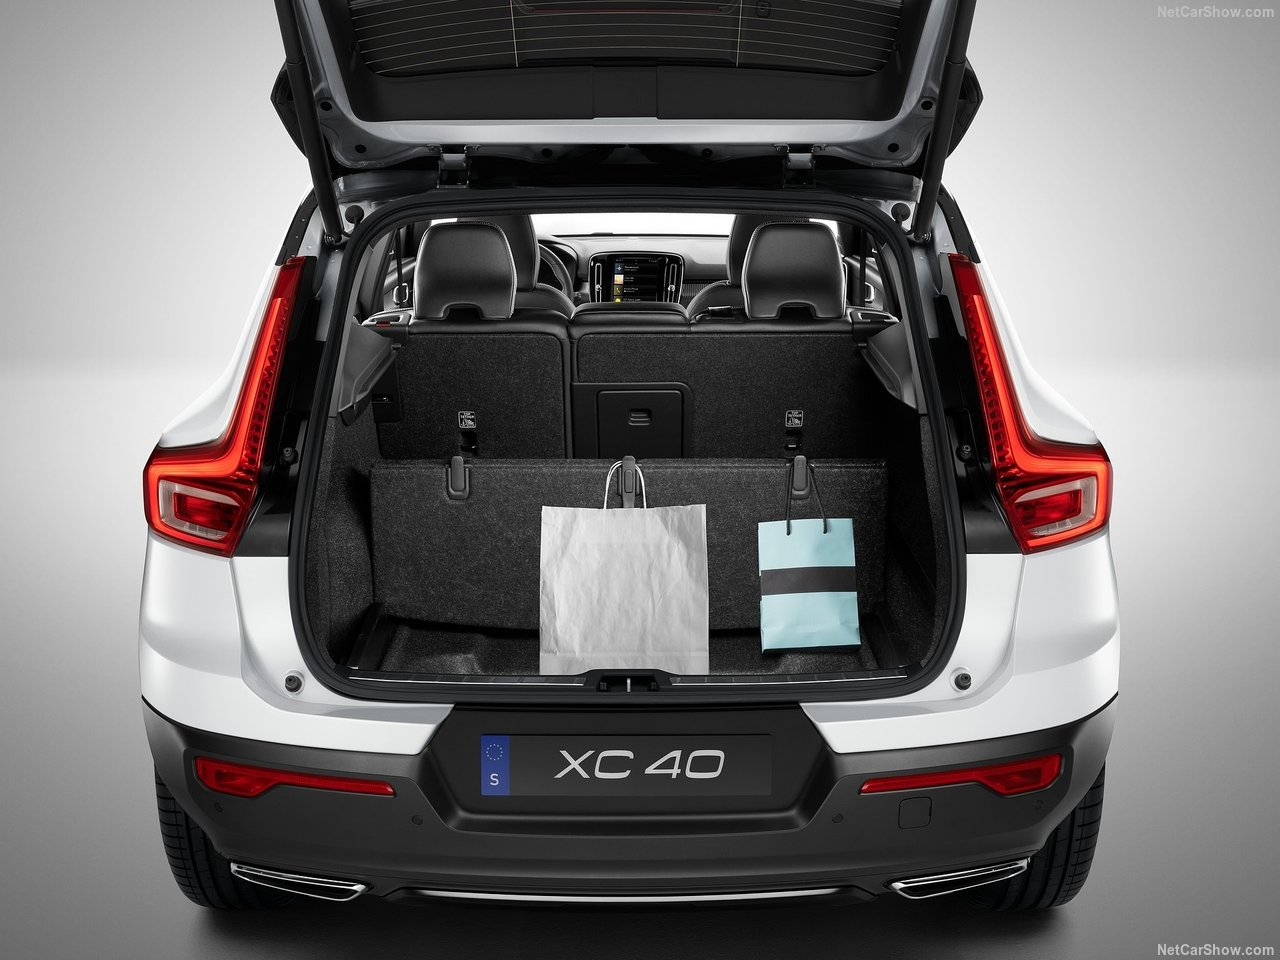 Volvo-XC40-2018-1280-85.jpg